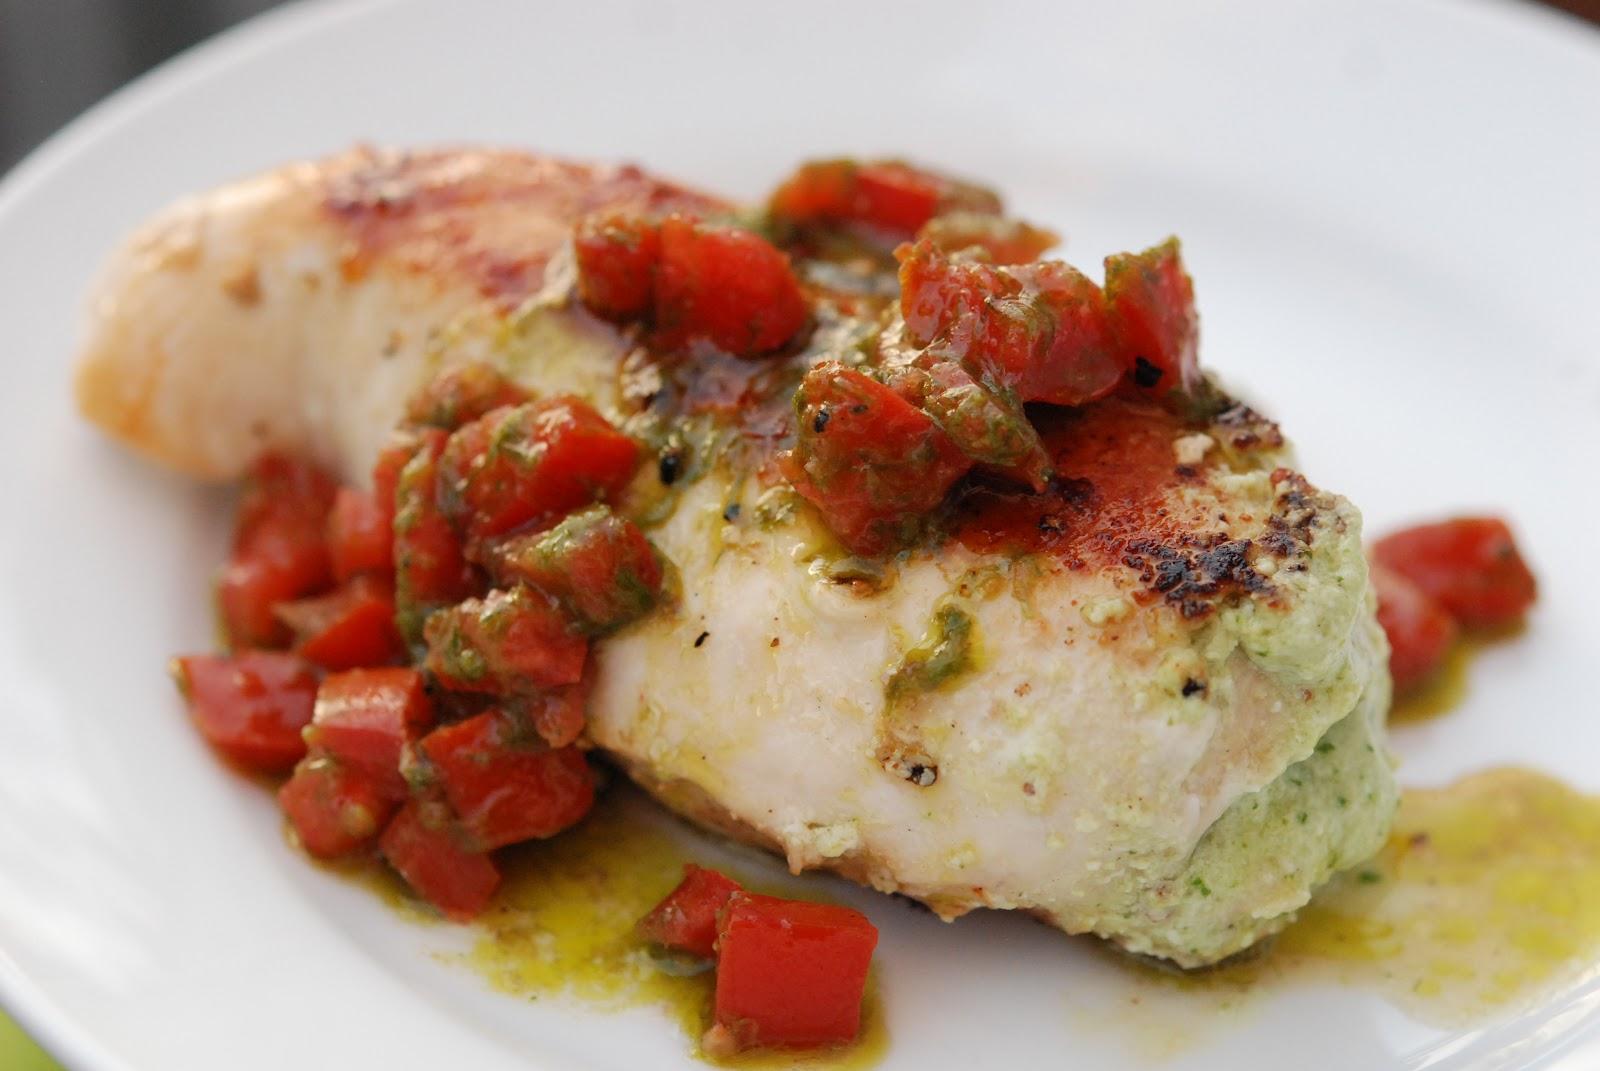 Basil Pesto and Ricotta Stuffed Chicken with a Tomato Vinaigrette ...